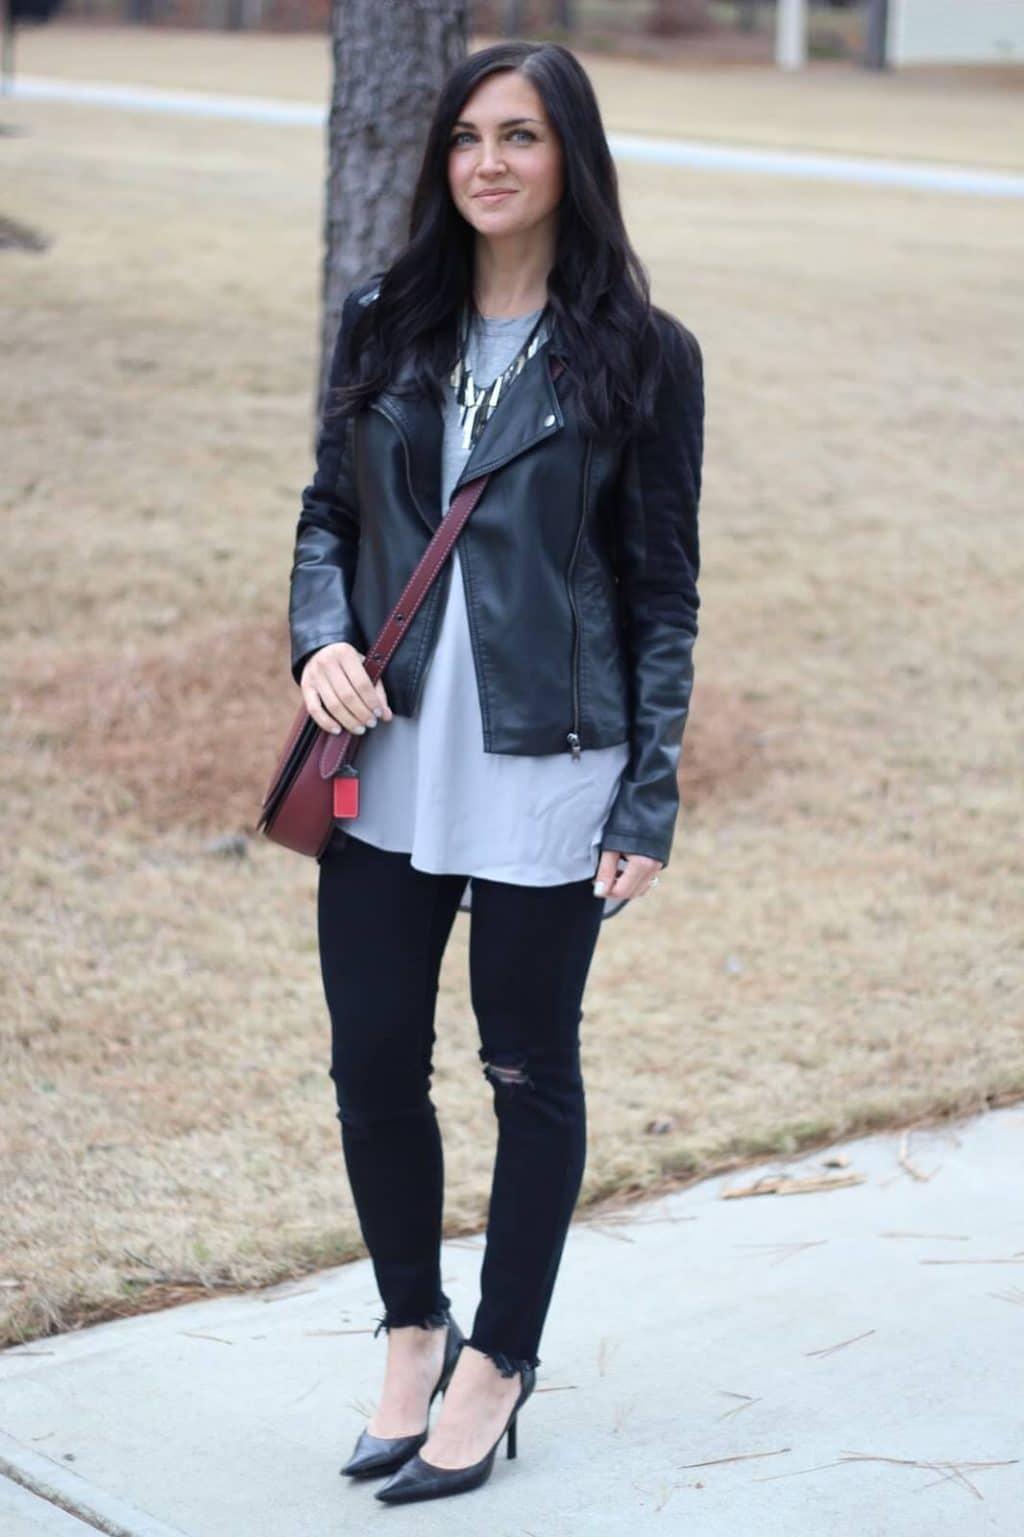 Leather Jacket, Distressed Denim, Coach Saddle Bag, Stilettos